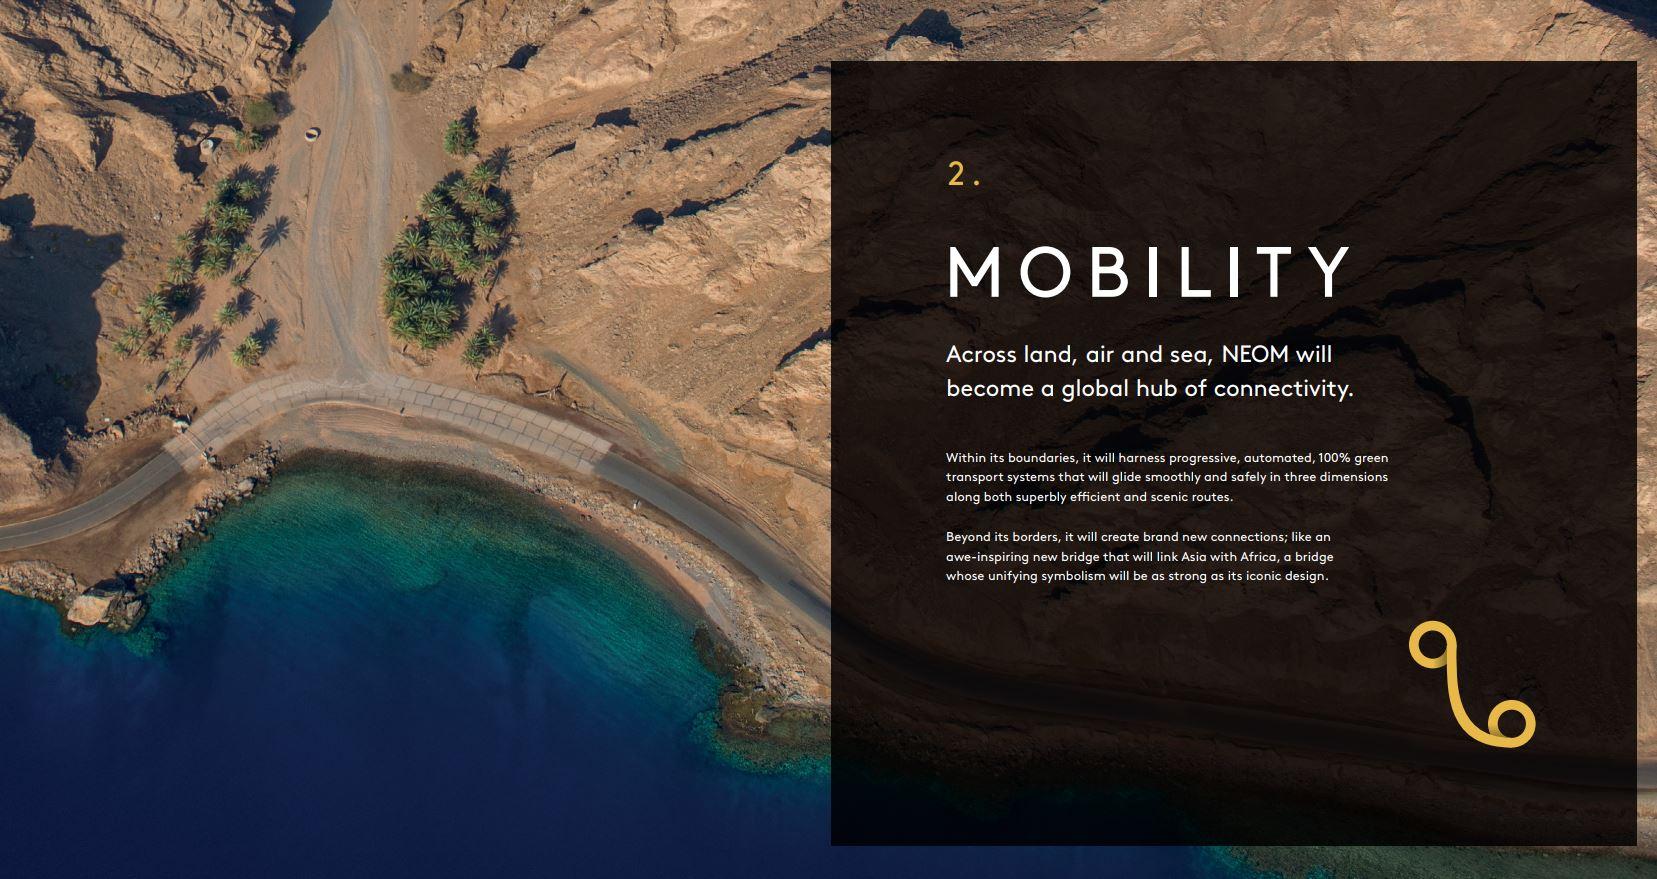 NEOM Mobilty